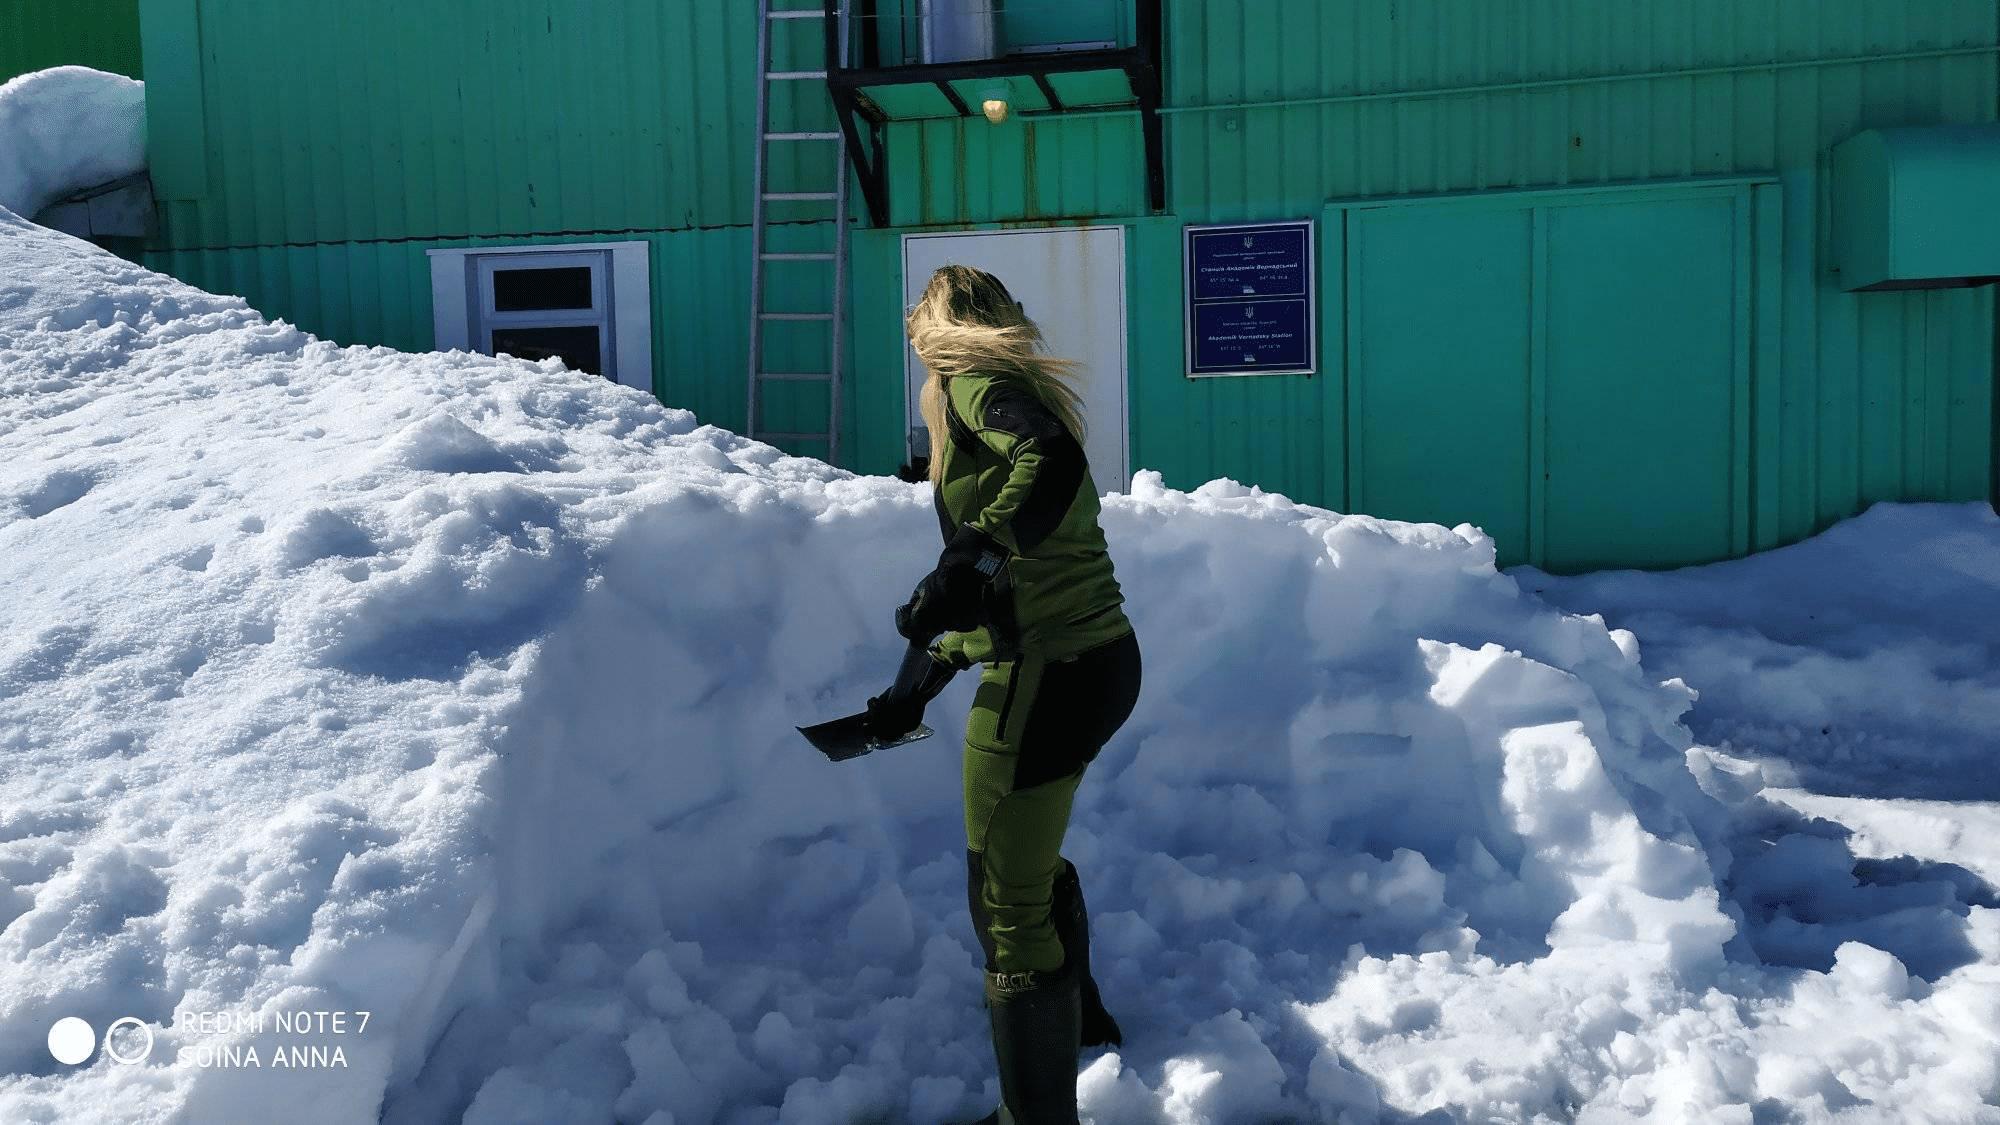 Anna Soina Академік Вернадський